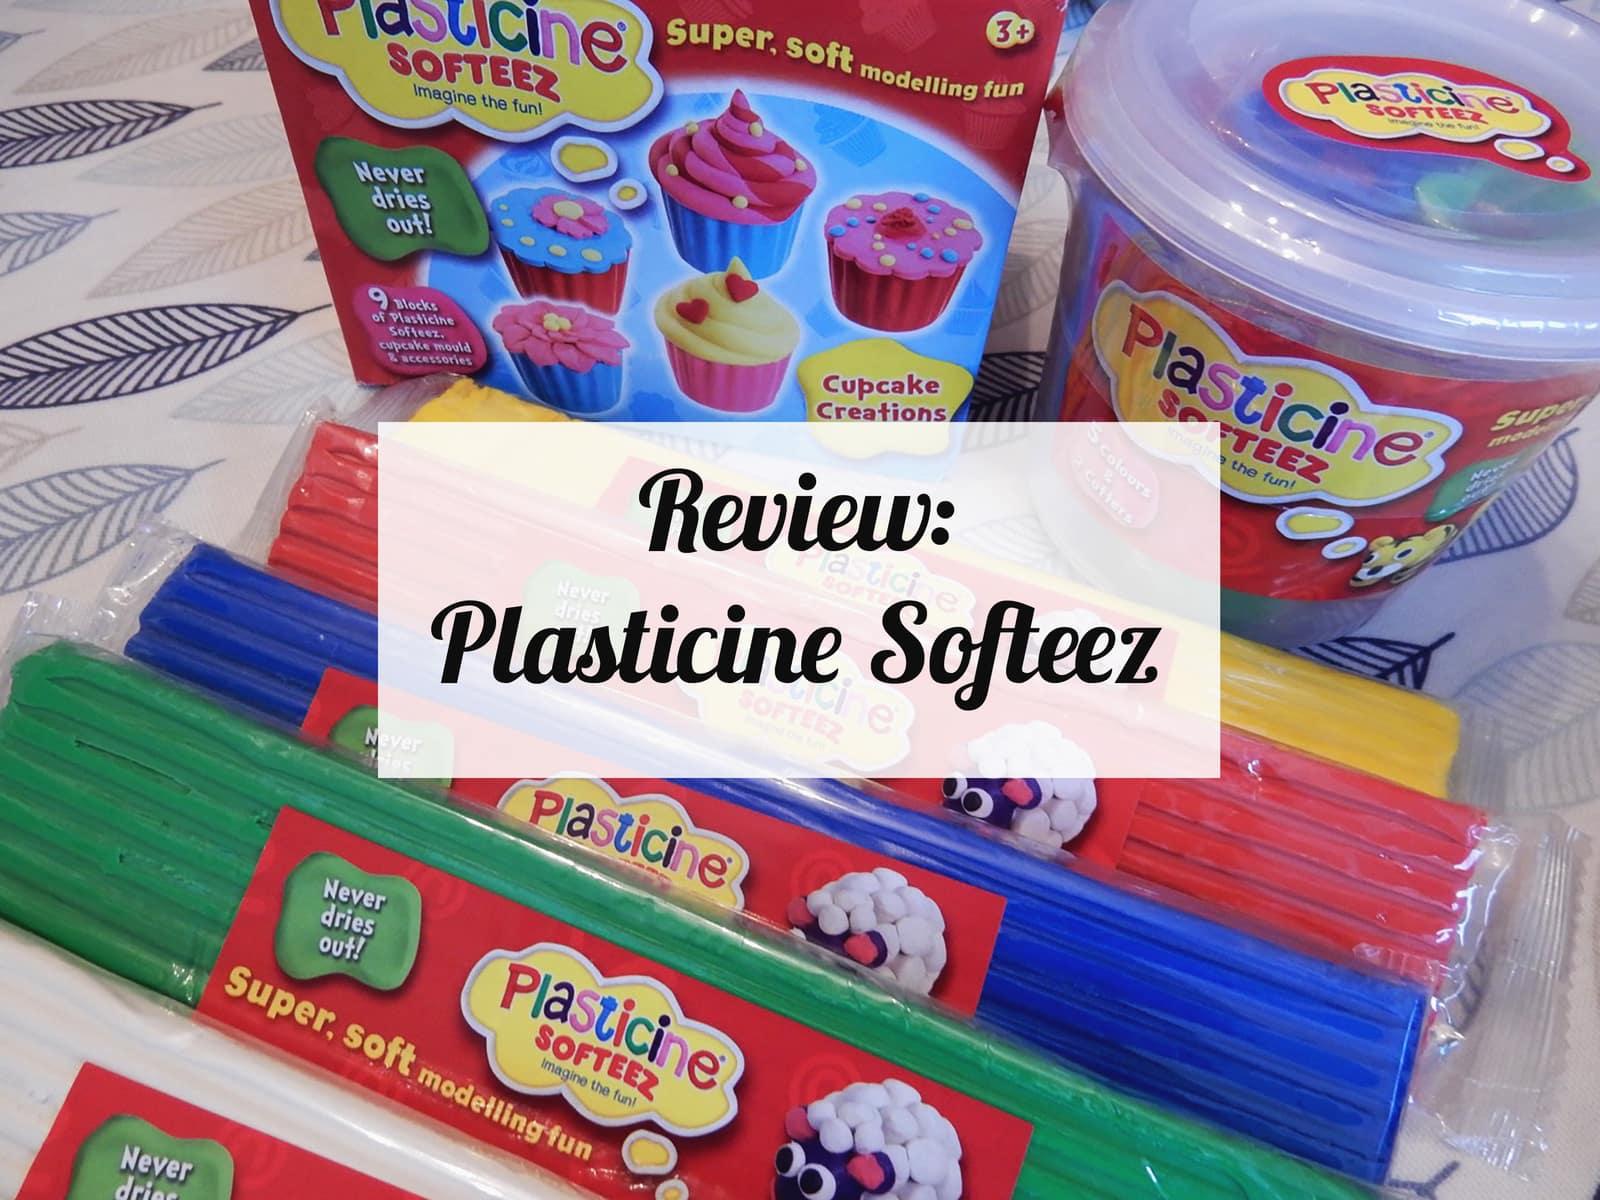 Review: Plasticine Softeez